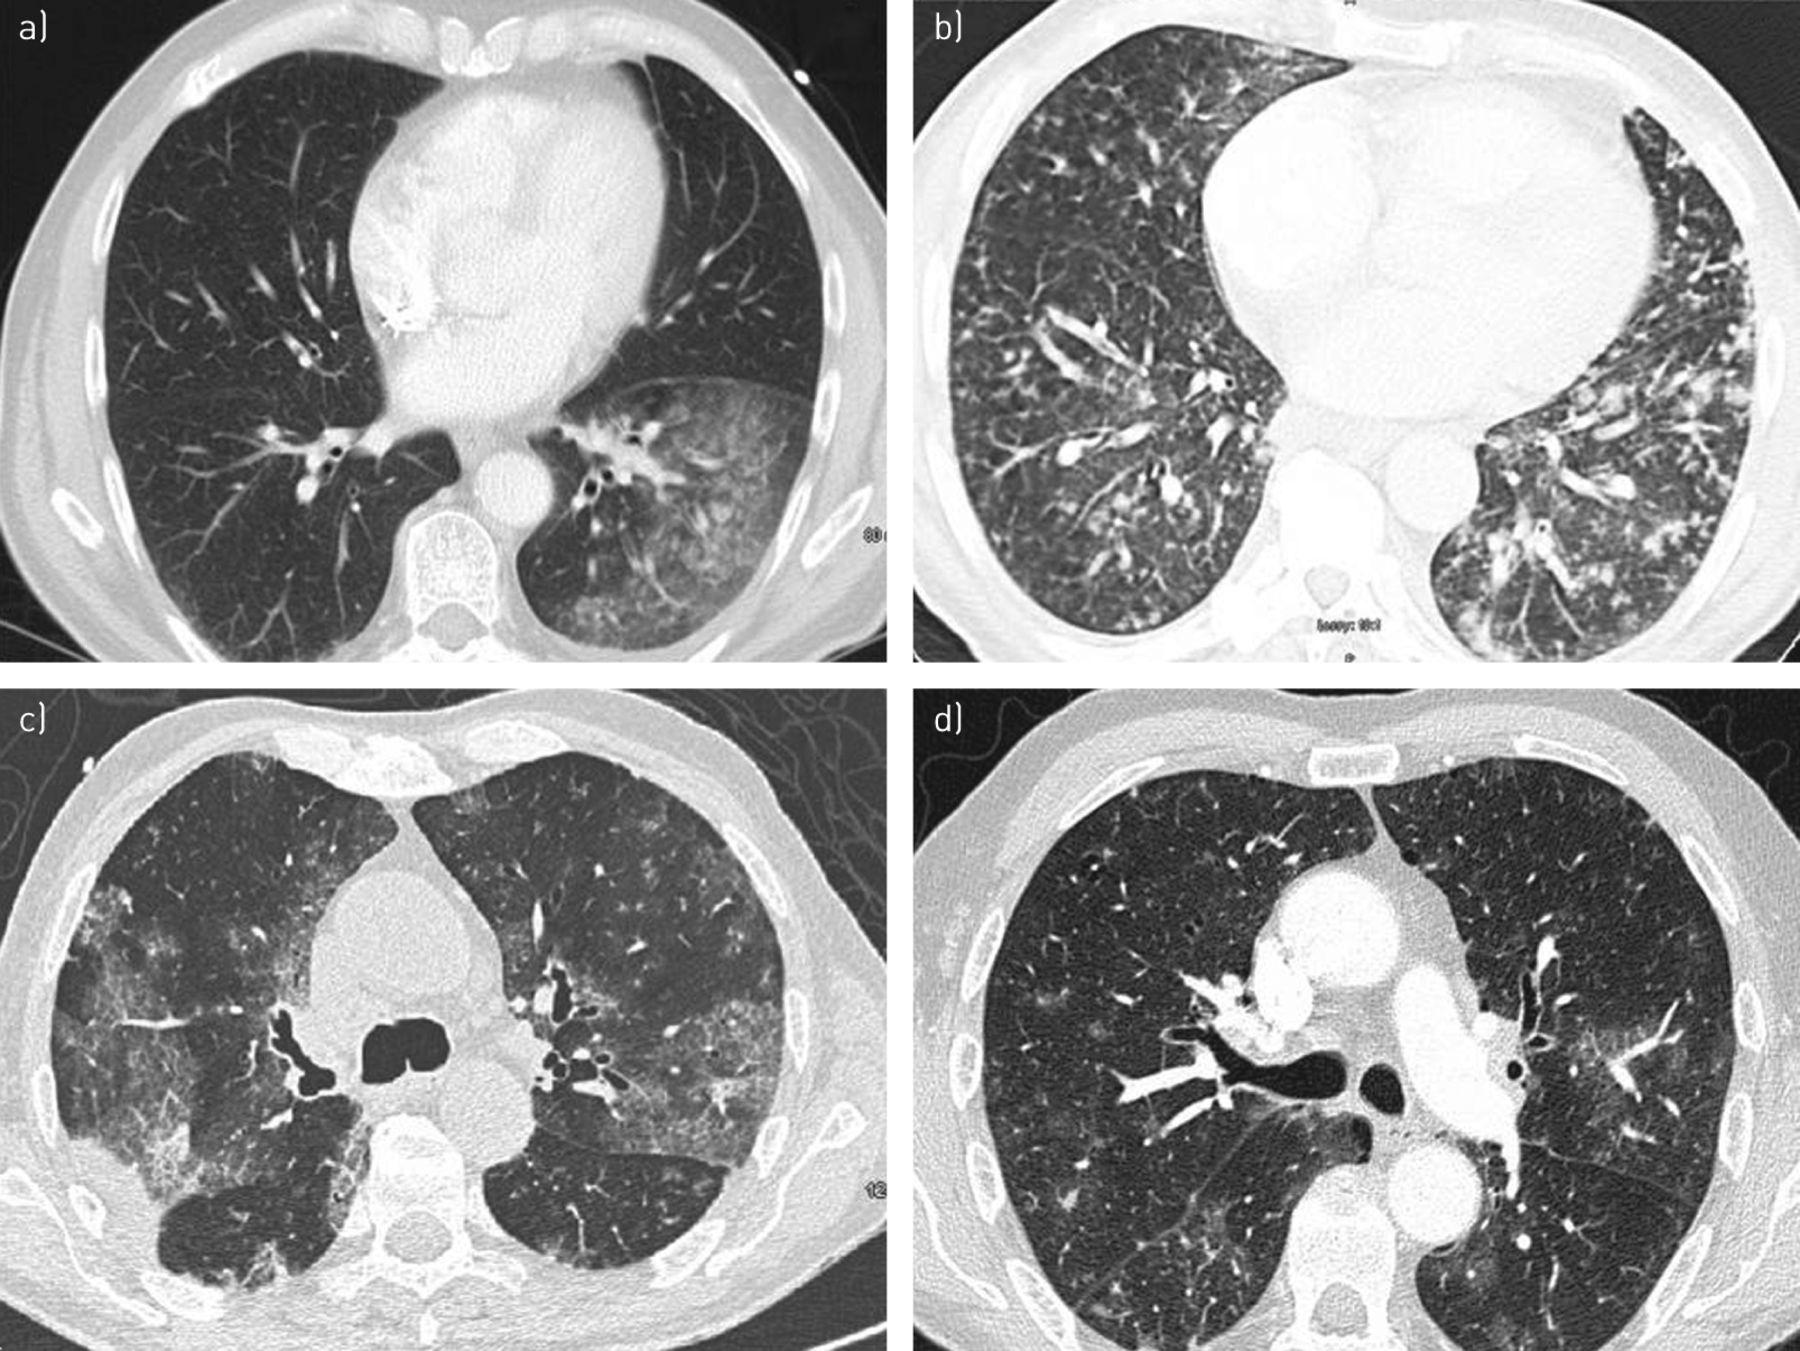 serious bronchopulmonary involvement due to chronic lymphocytic leukaemia